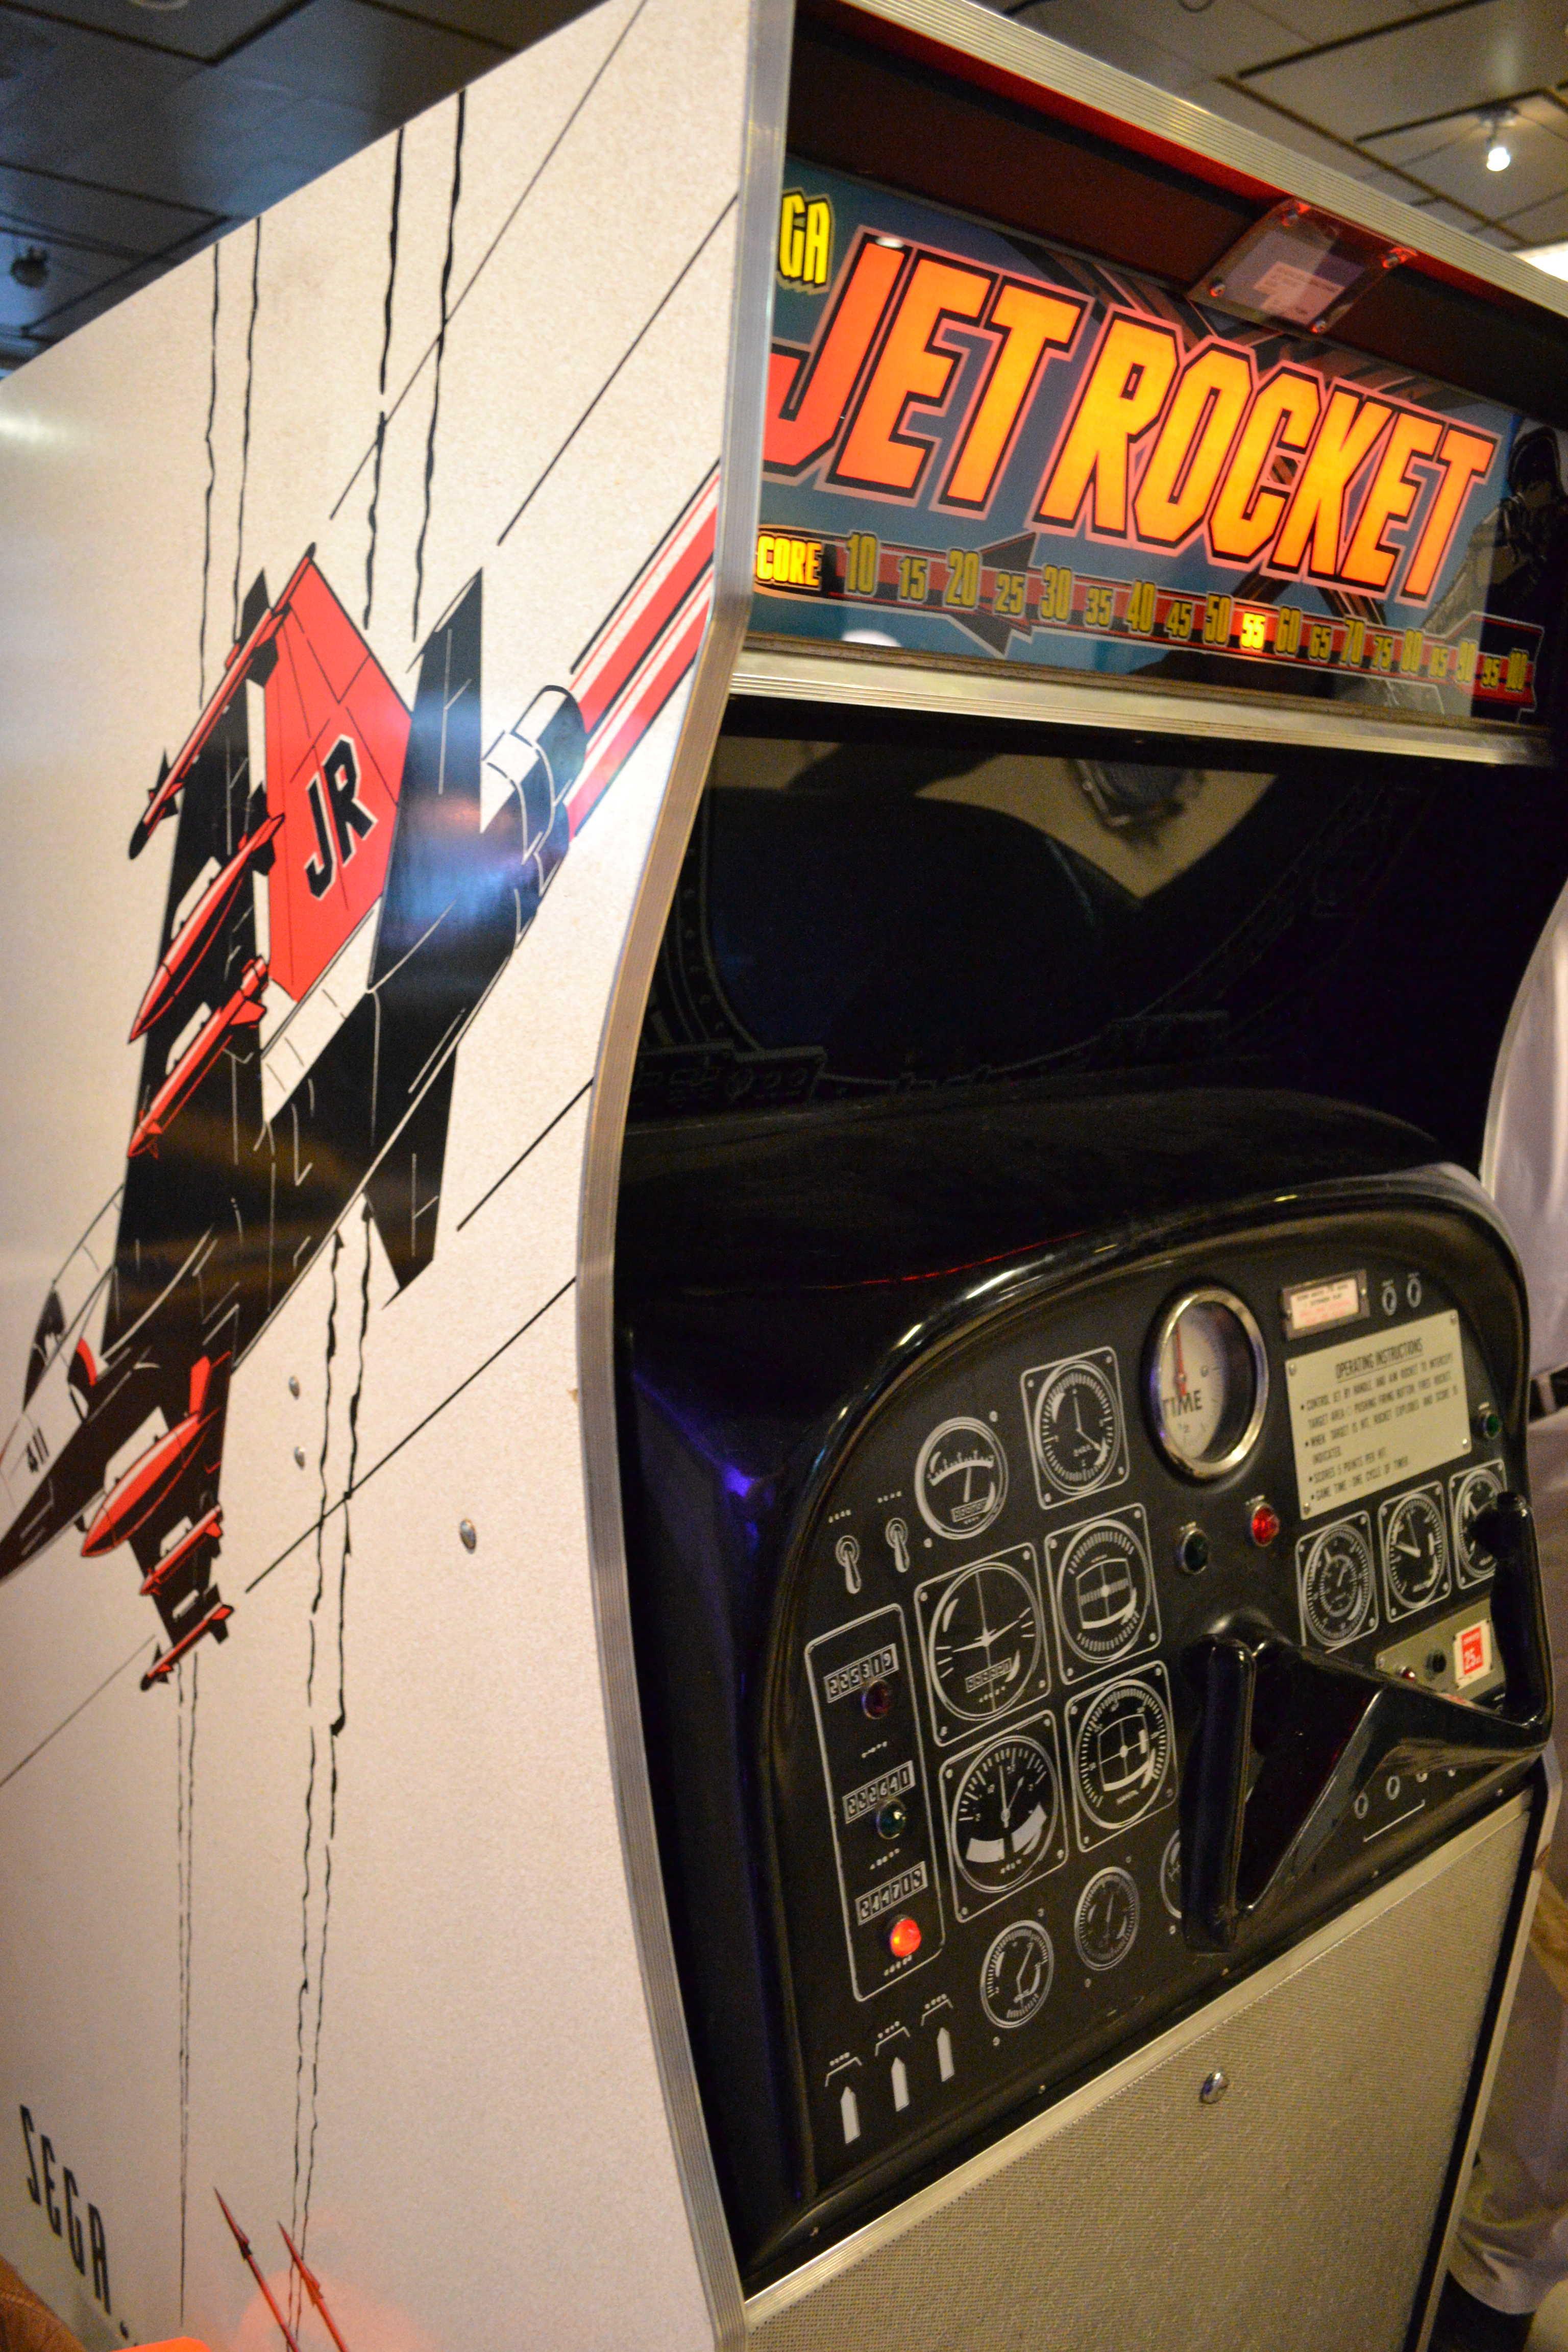 jet rocket  sega  1970